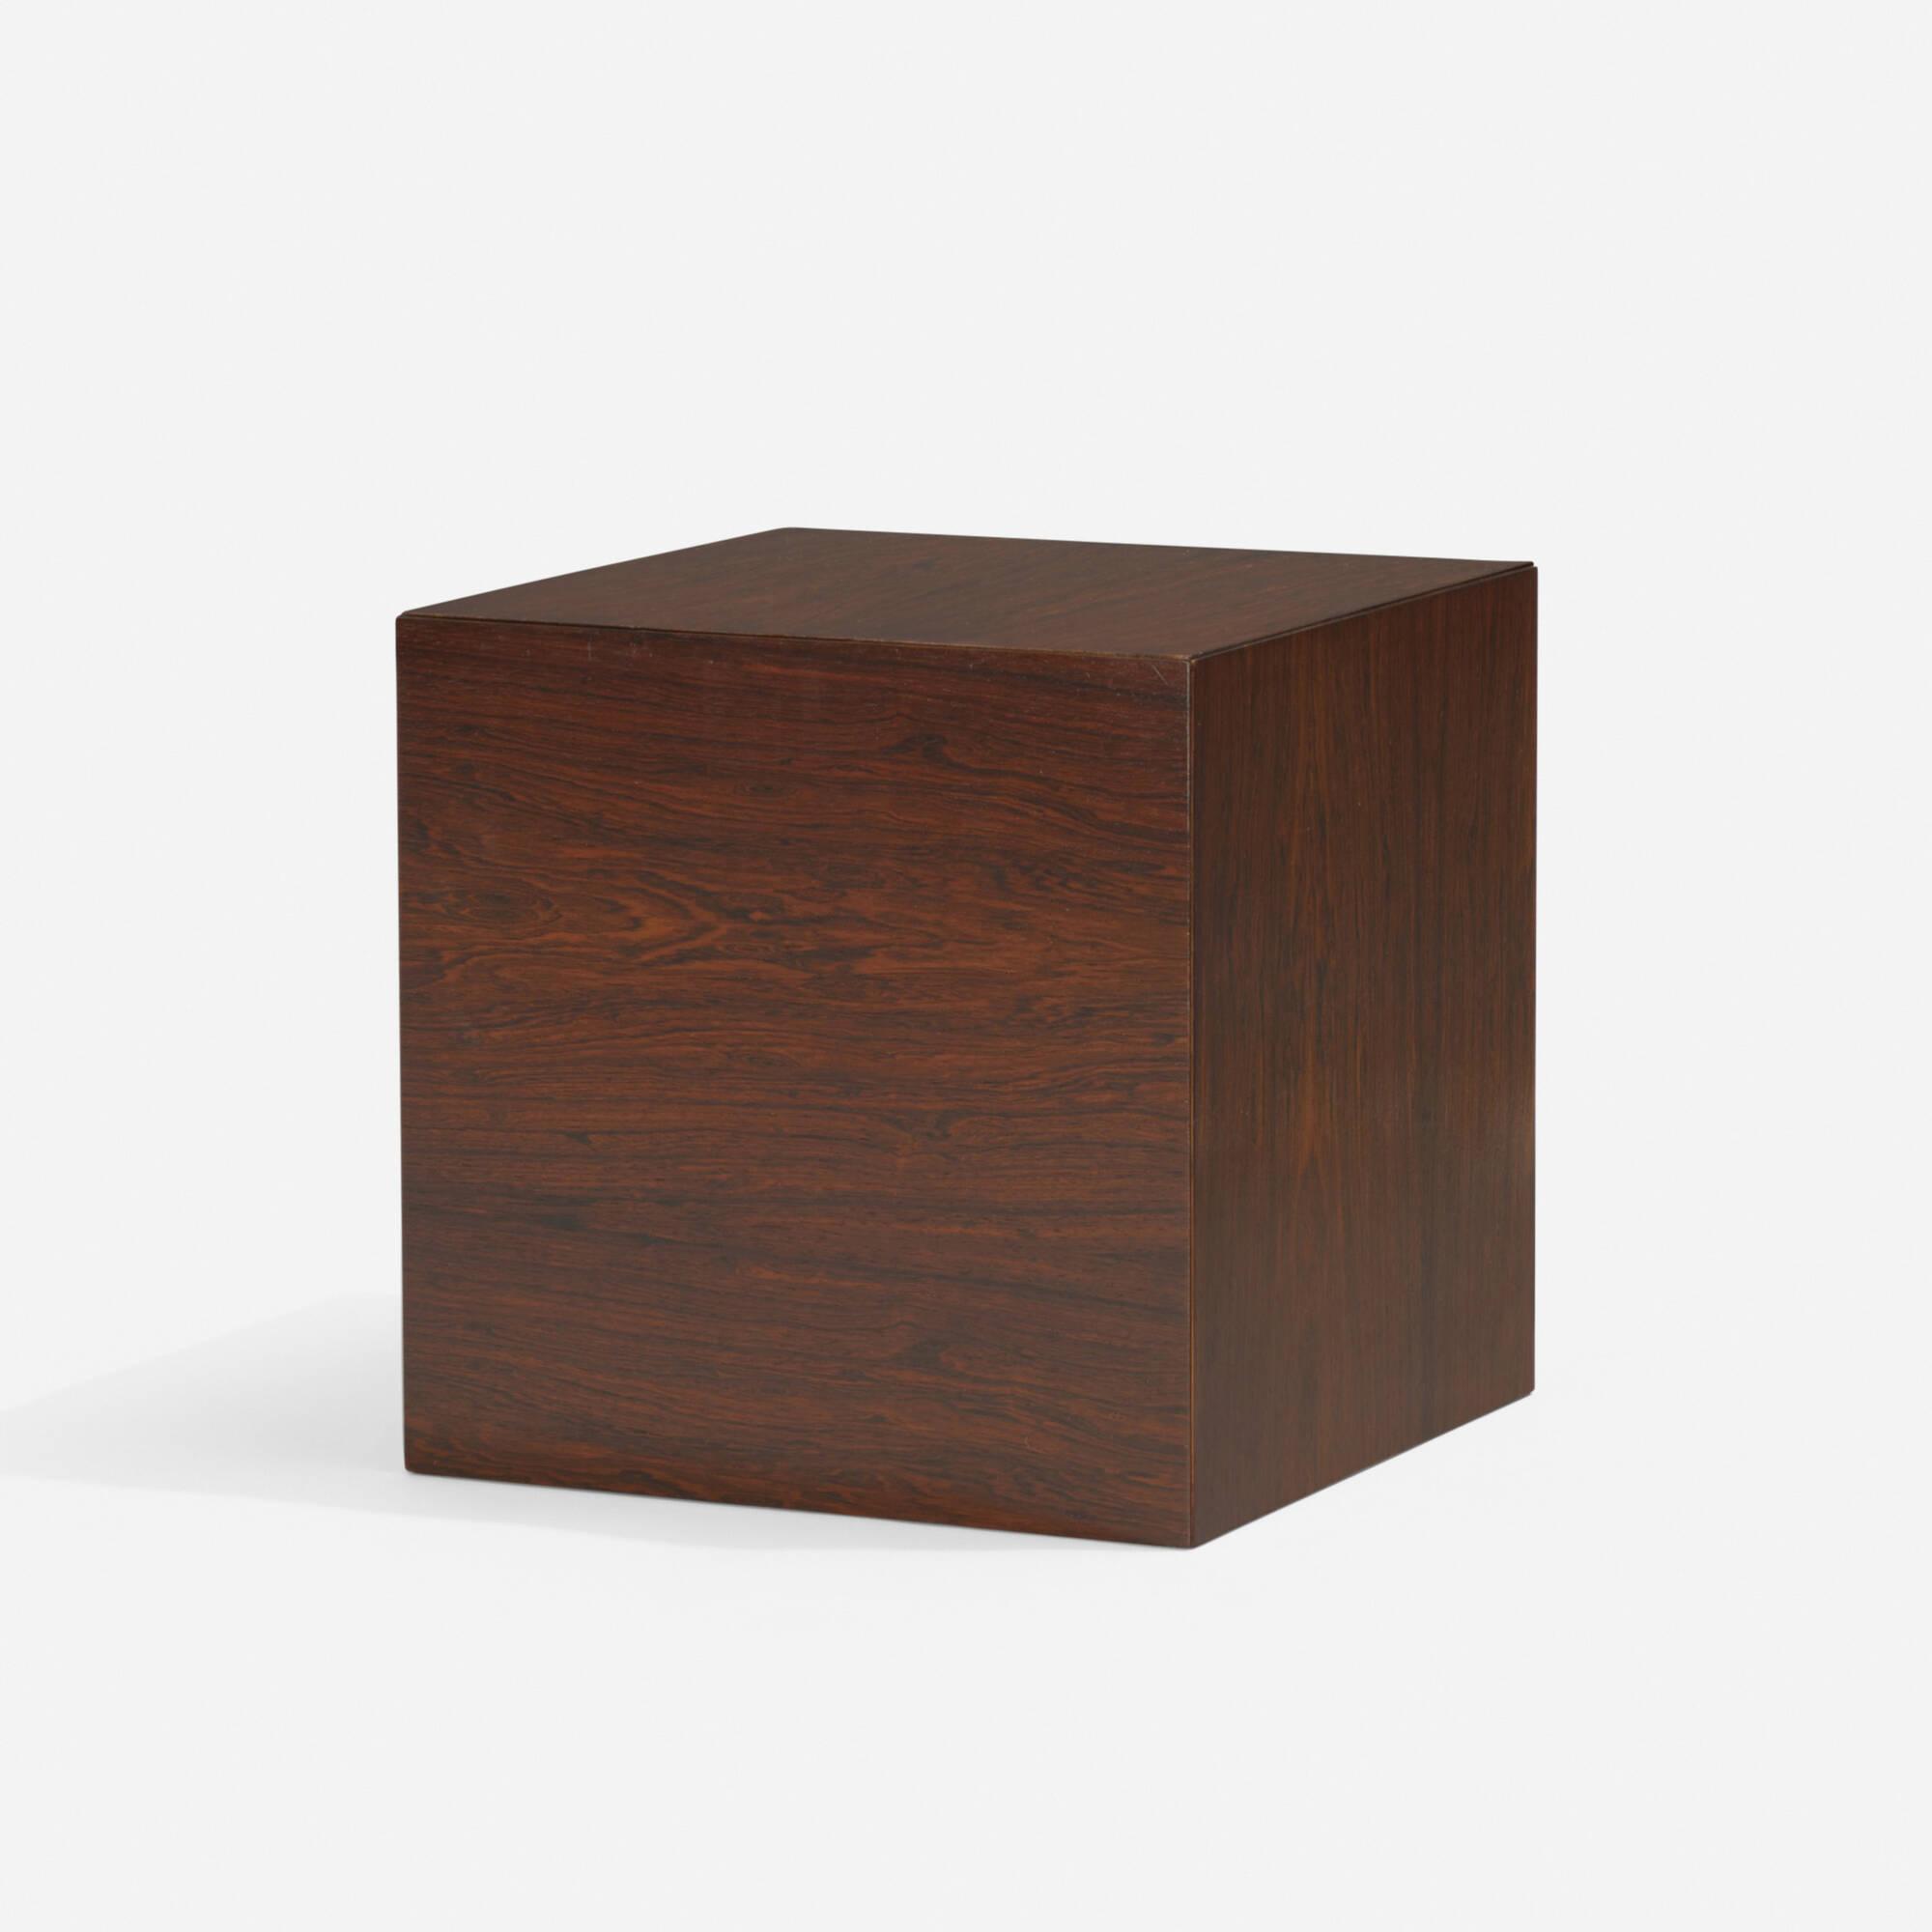 147: Poul Nørreklit / cube nesting tables, set of six (2 of 5)